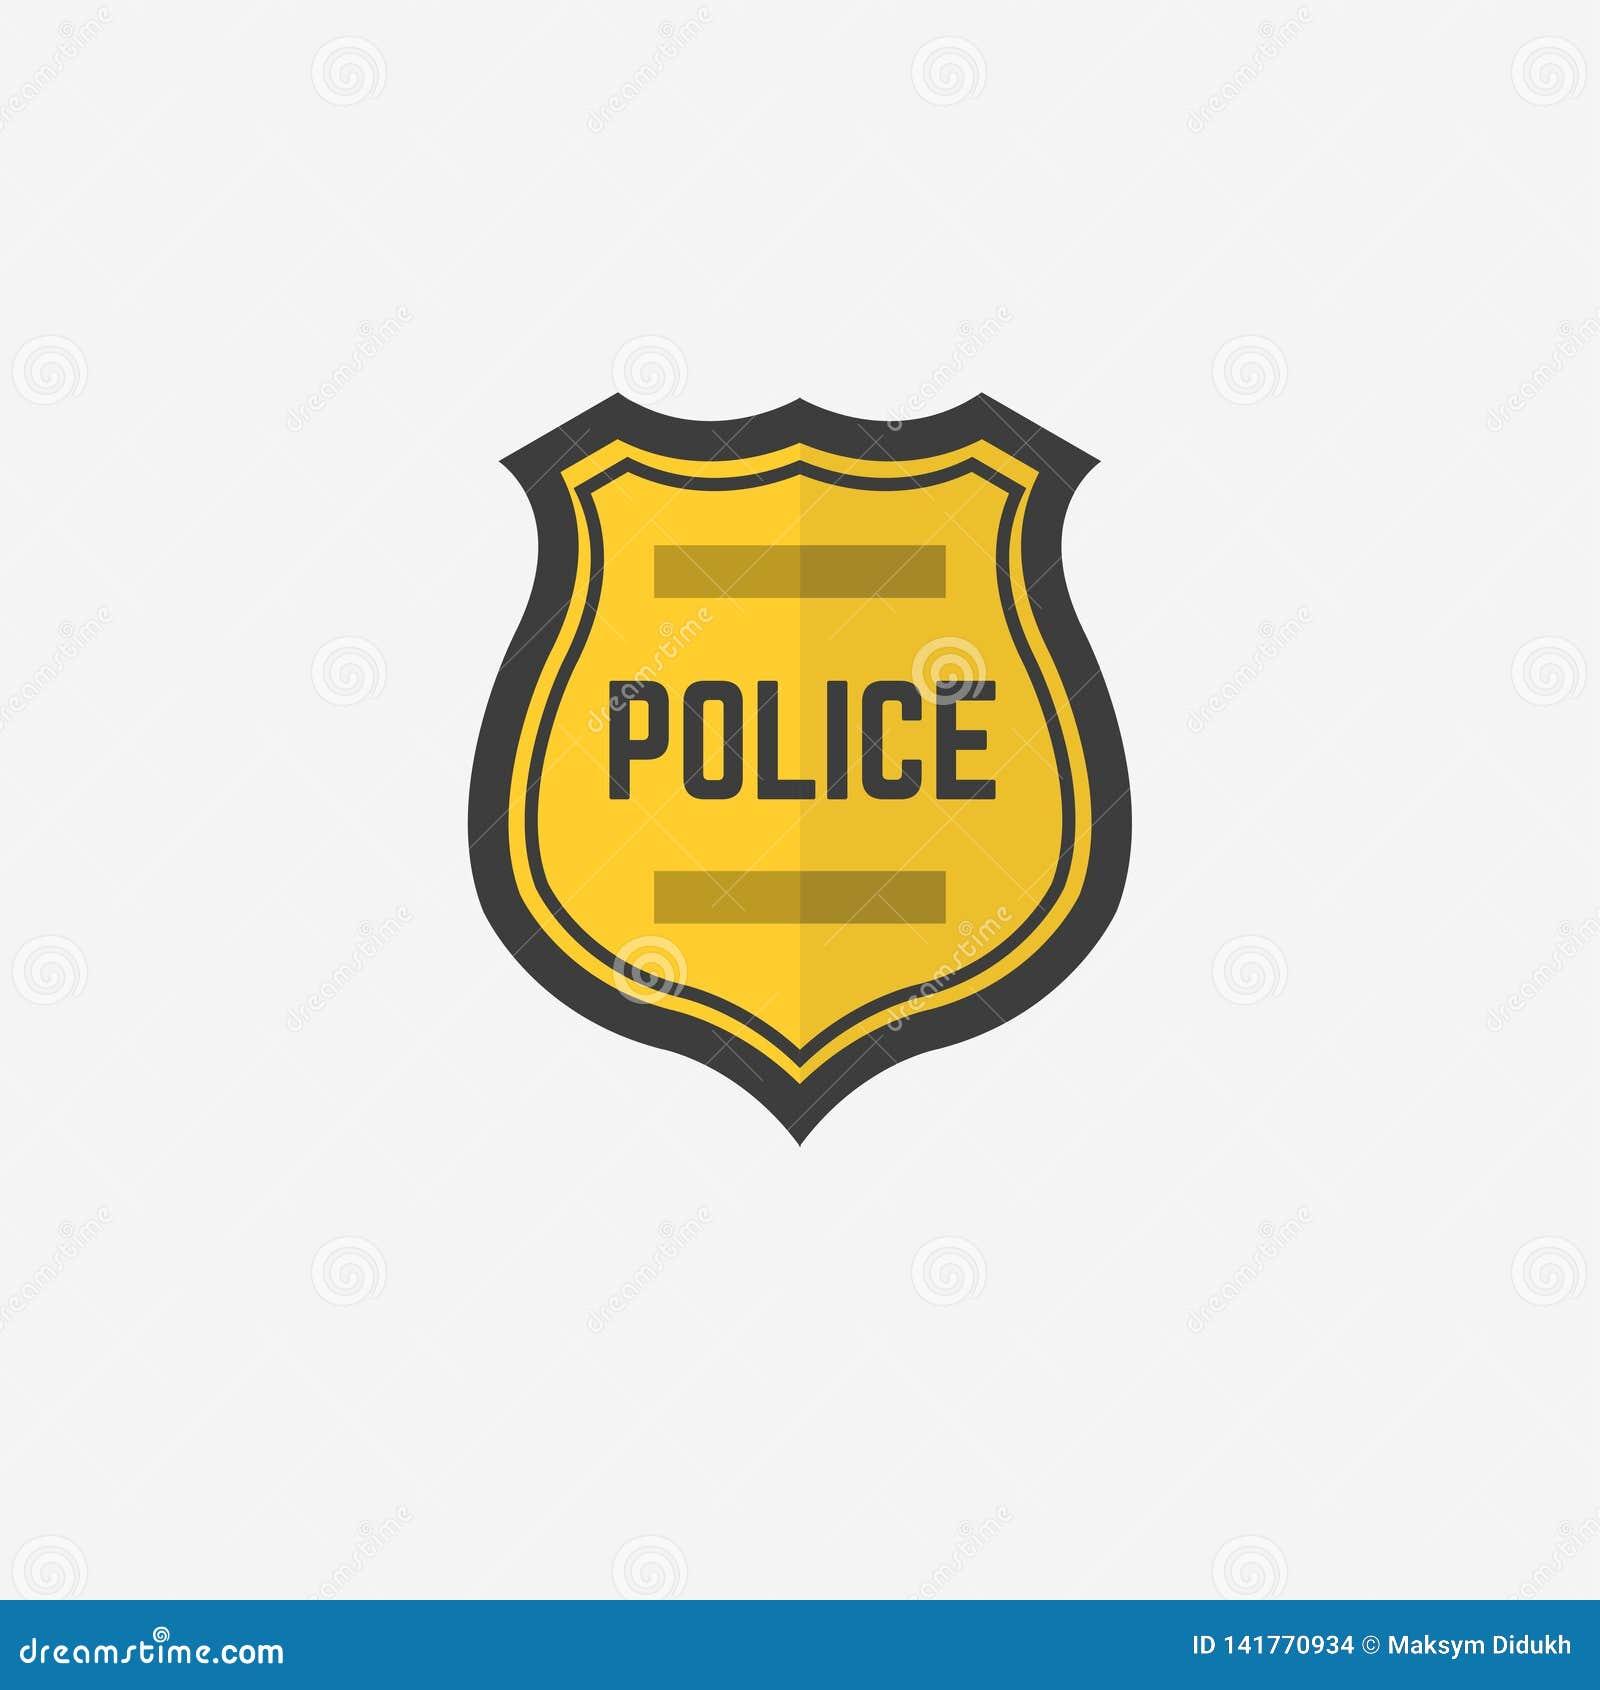 Police badge. Icon police badge. Vector illustration. EPS 10